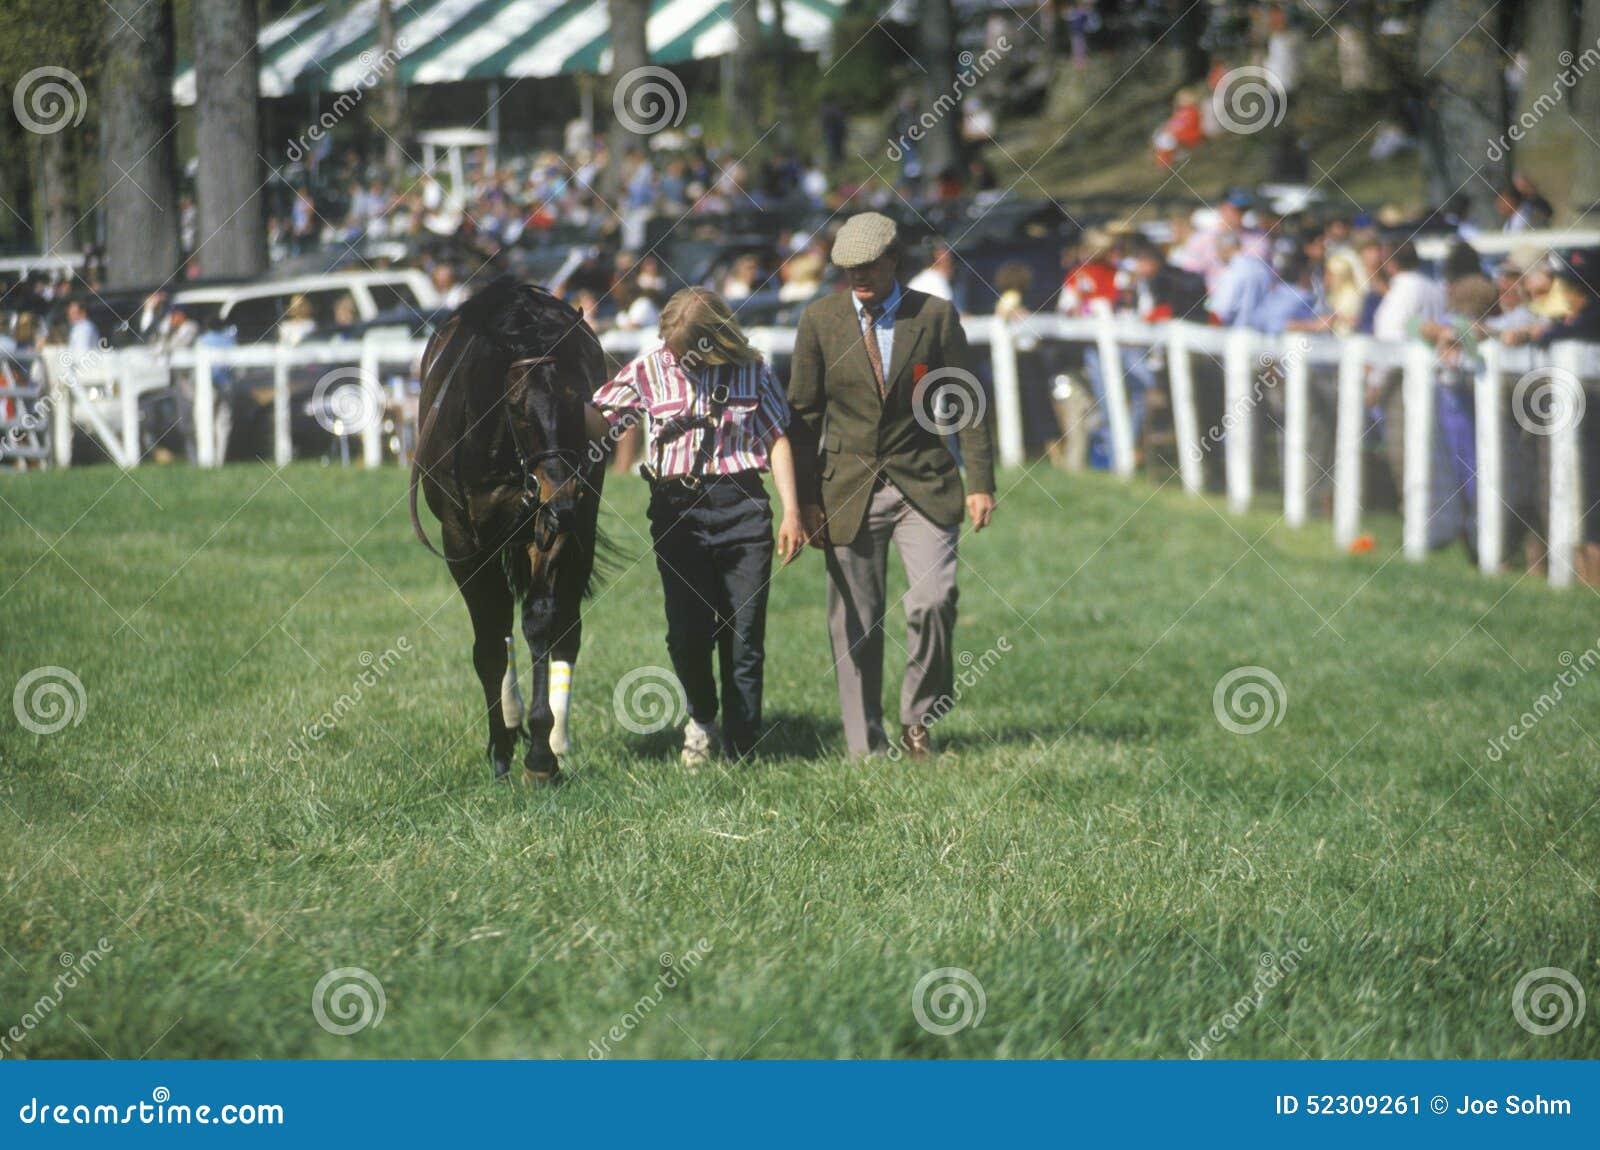 Walker with horse during Spring Steeplechase race, Glenwood Park, Middleburg, Virginia